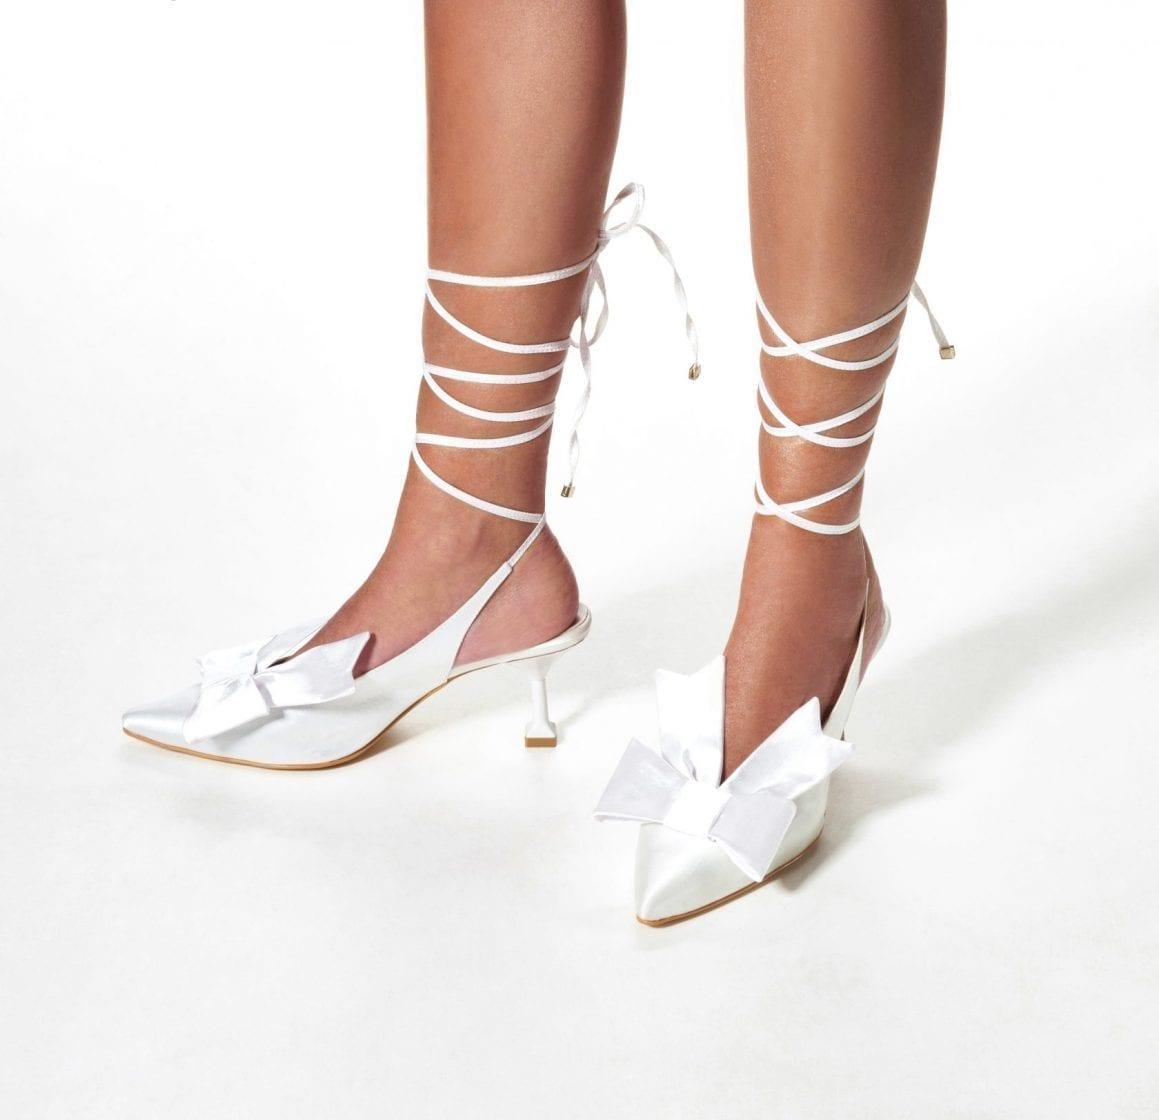 LEGS 7